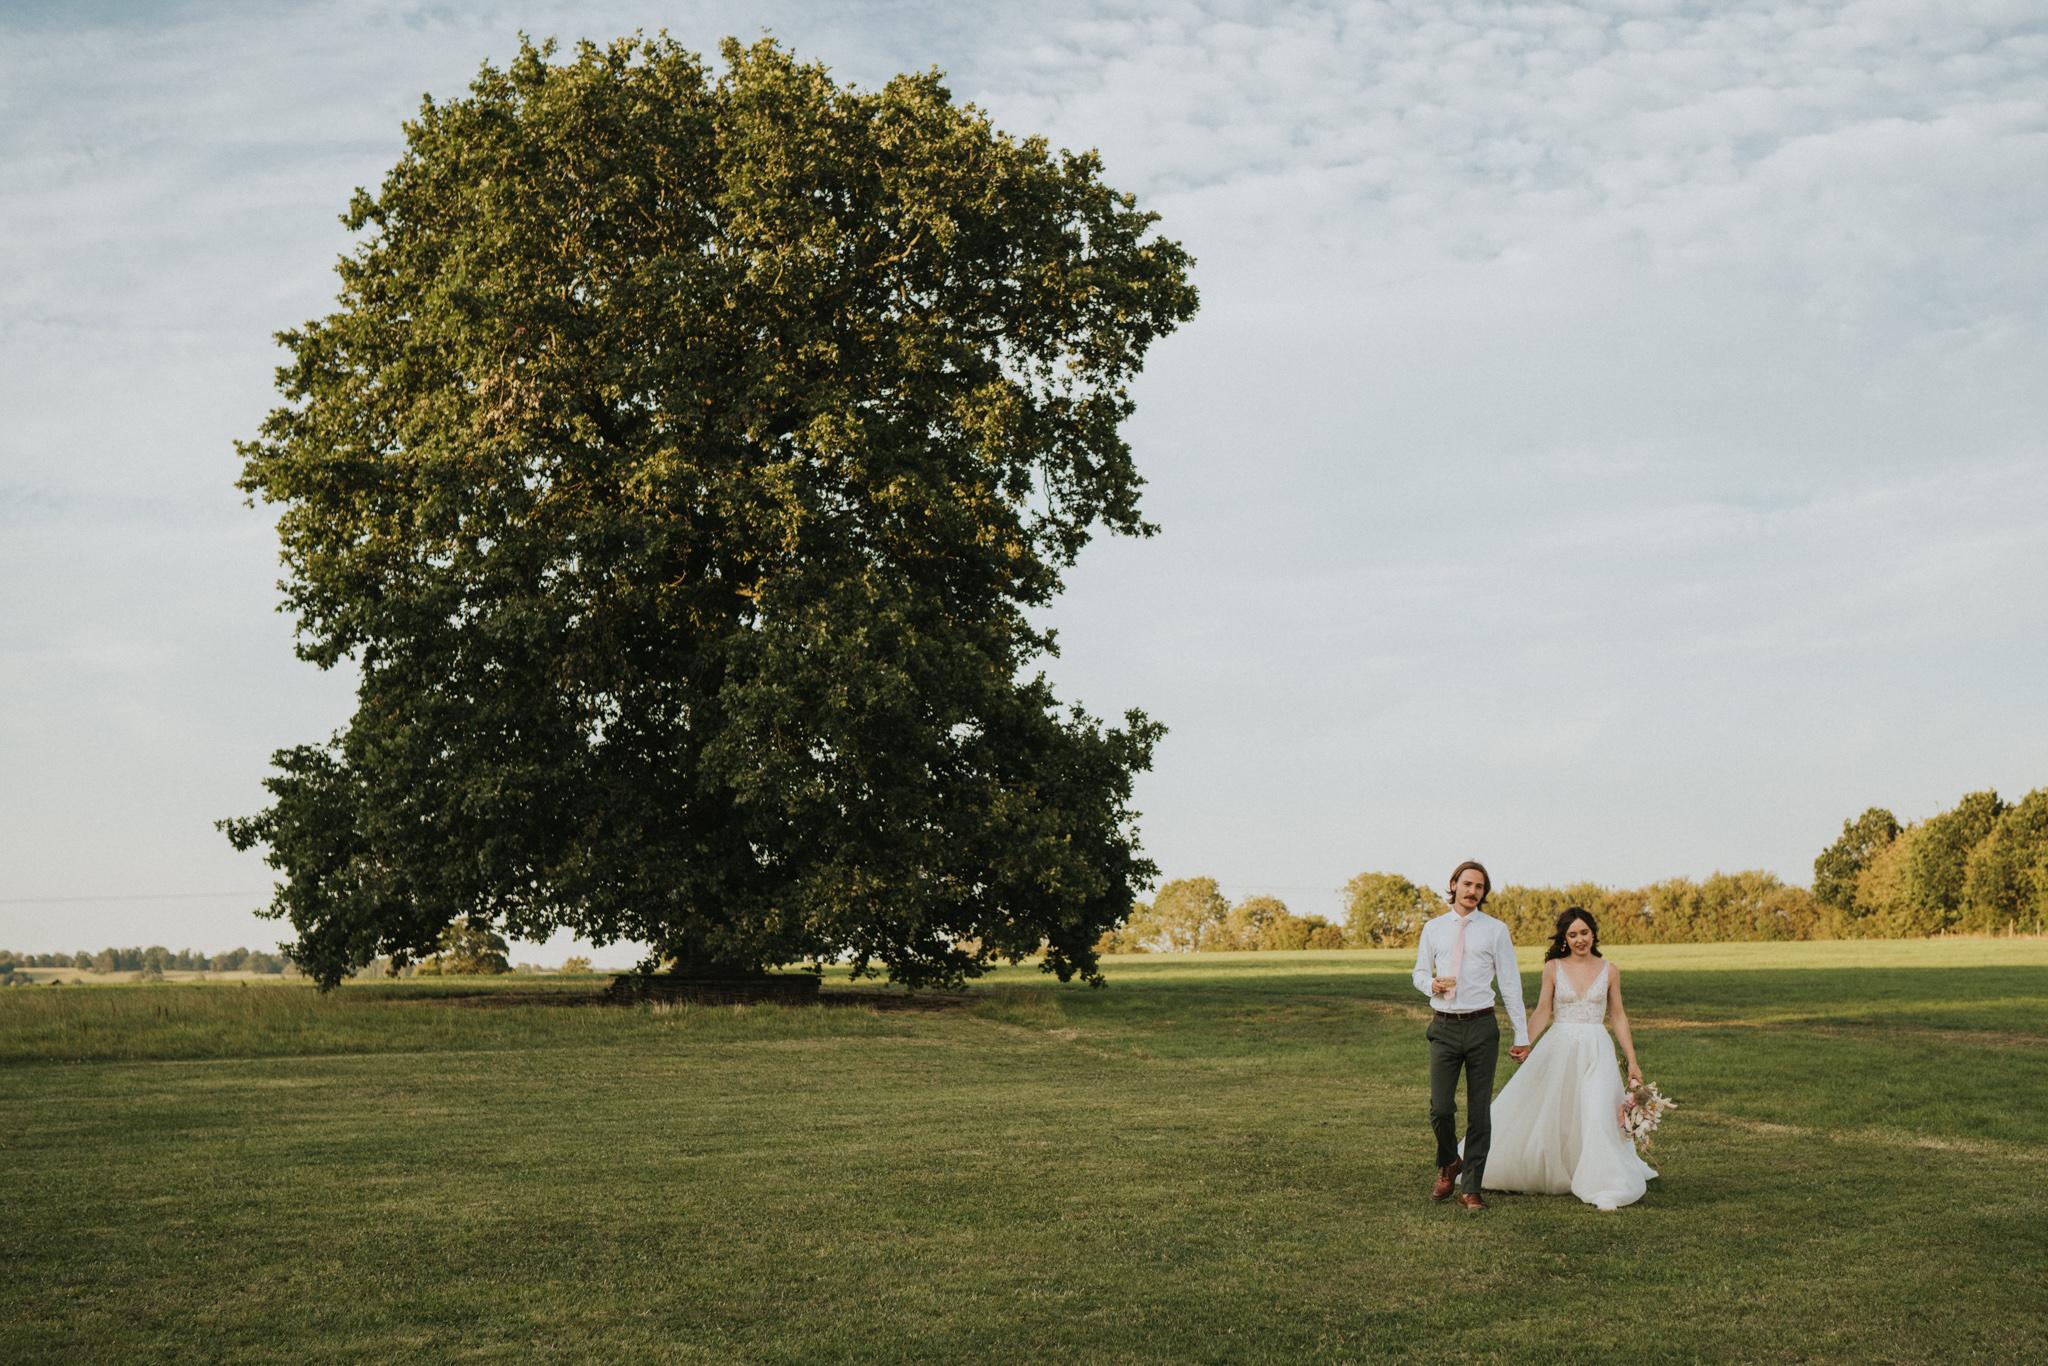 emi-Jack-boho-diy-wedding-eggington-house-grace-elizabeth-colchester-essex-alternative-wedding-photographer-suffolk-norfolk-devon (51 of 56).jpg